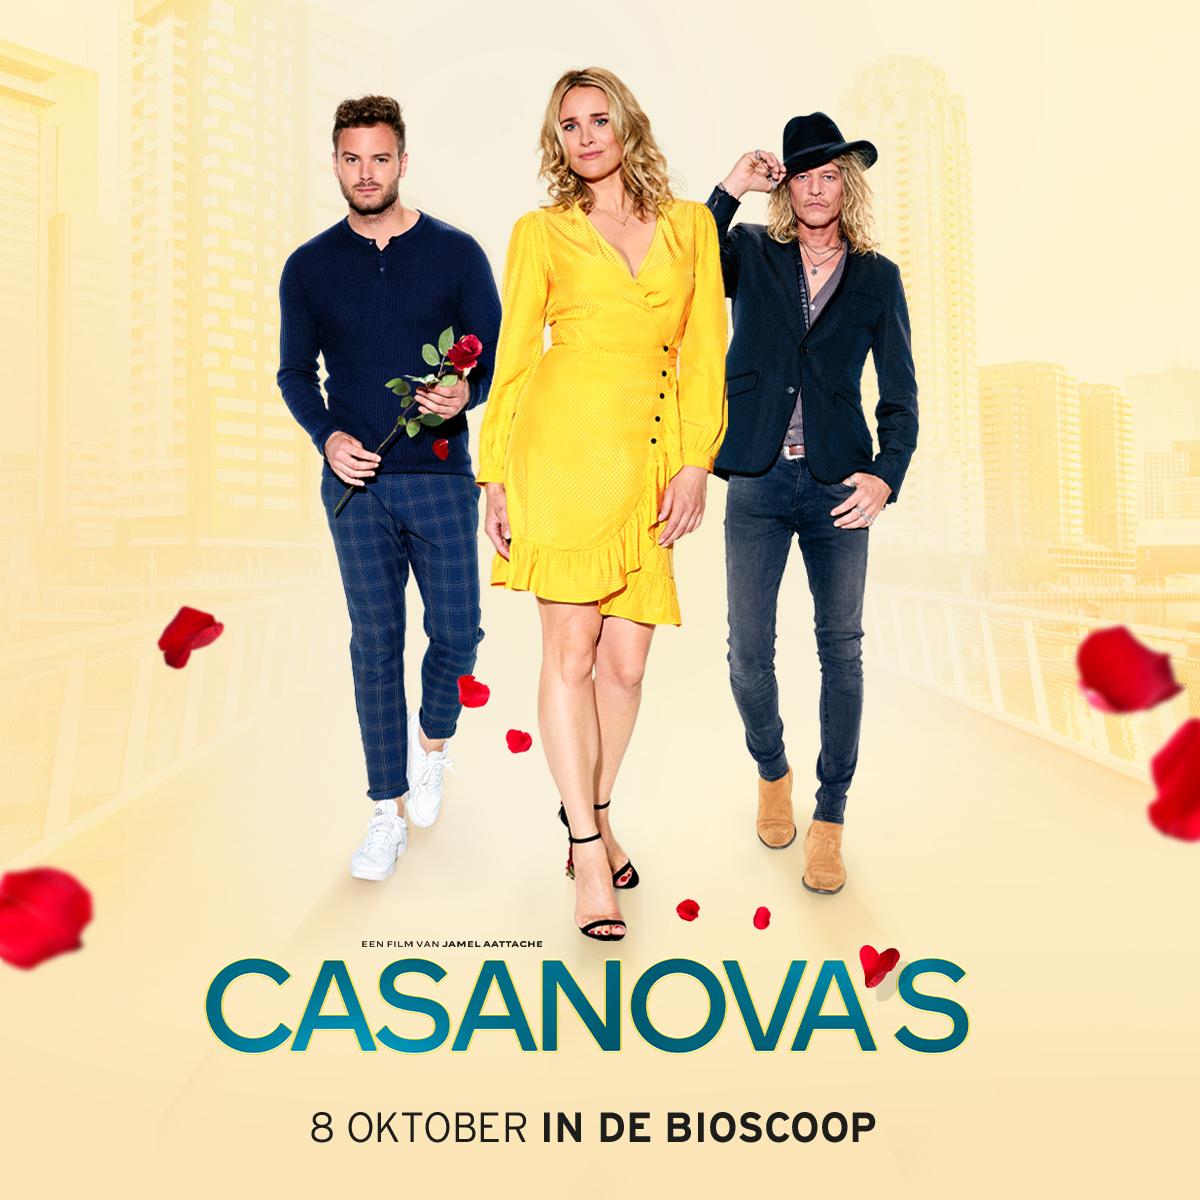 De poster van Casanova's